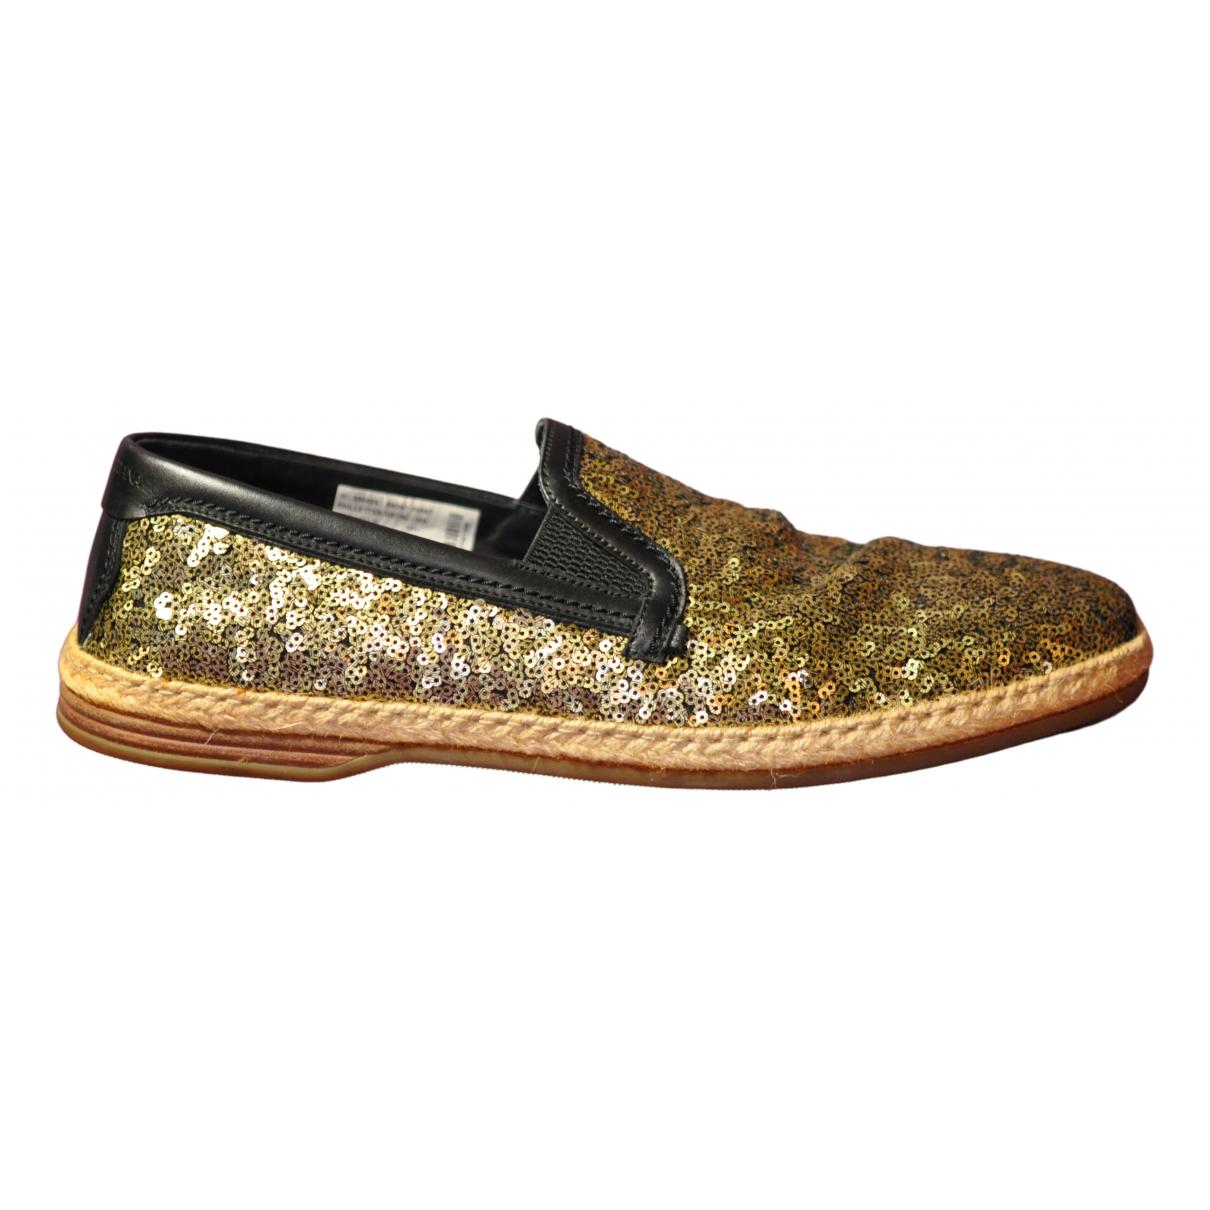 Dolce & Gabbana \N Sneakers in  Gold Mit Pailletten